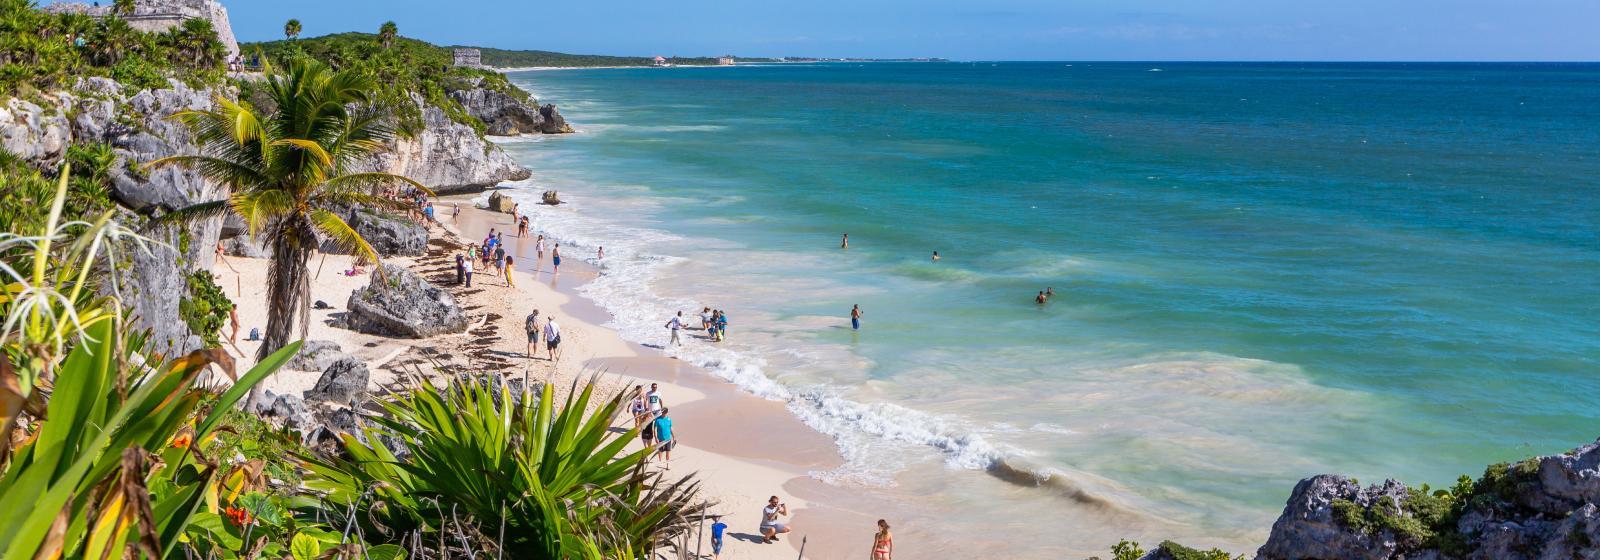 Things to do in Riviera Maya & the Yucatan